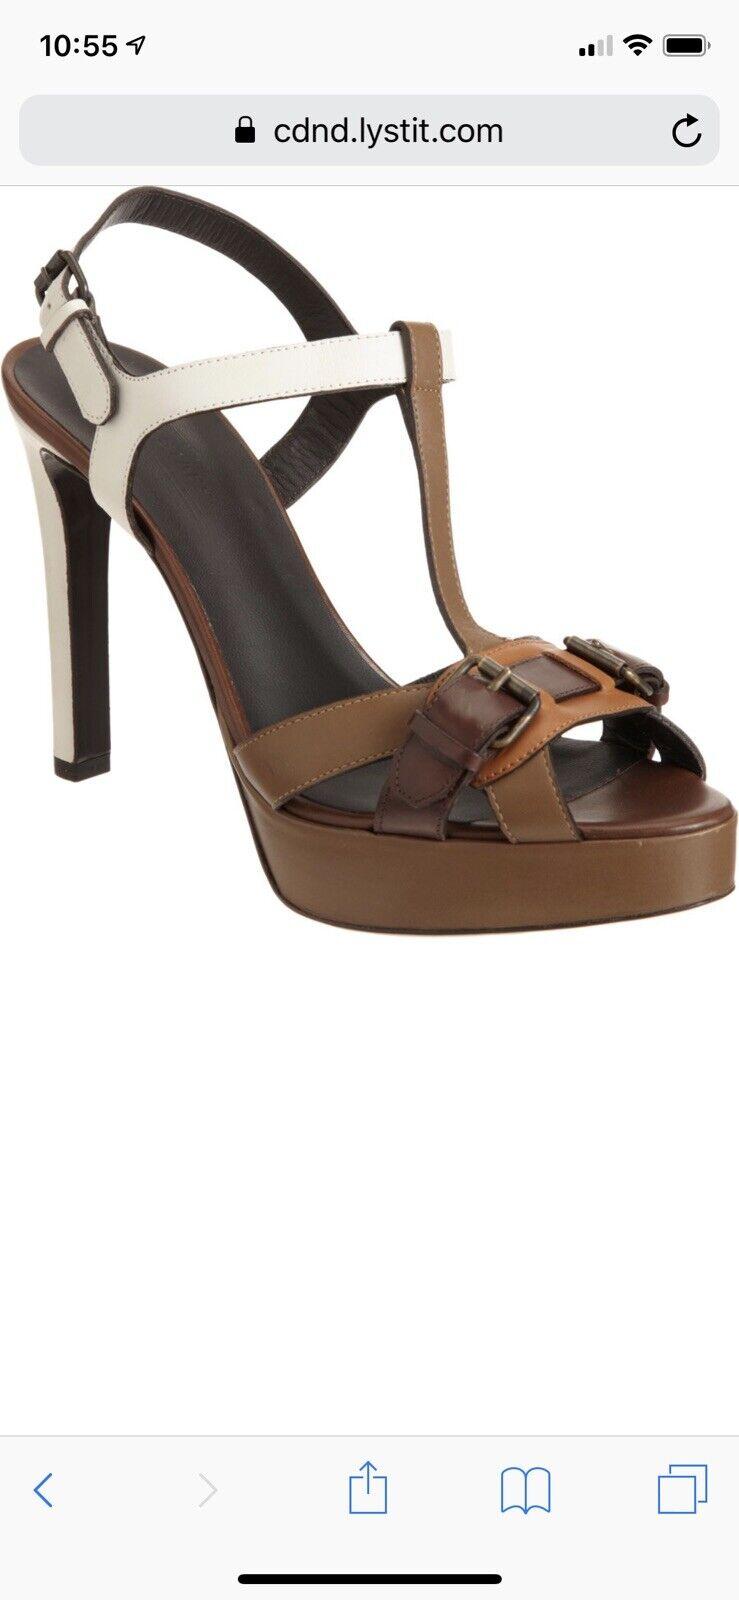 Belstaff Womens shoes Size 41 10M  Brown Leather Platform T Strap Sandals Heels